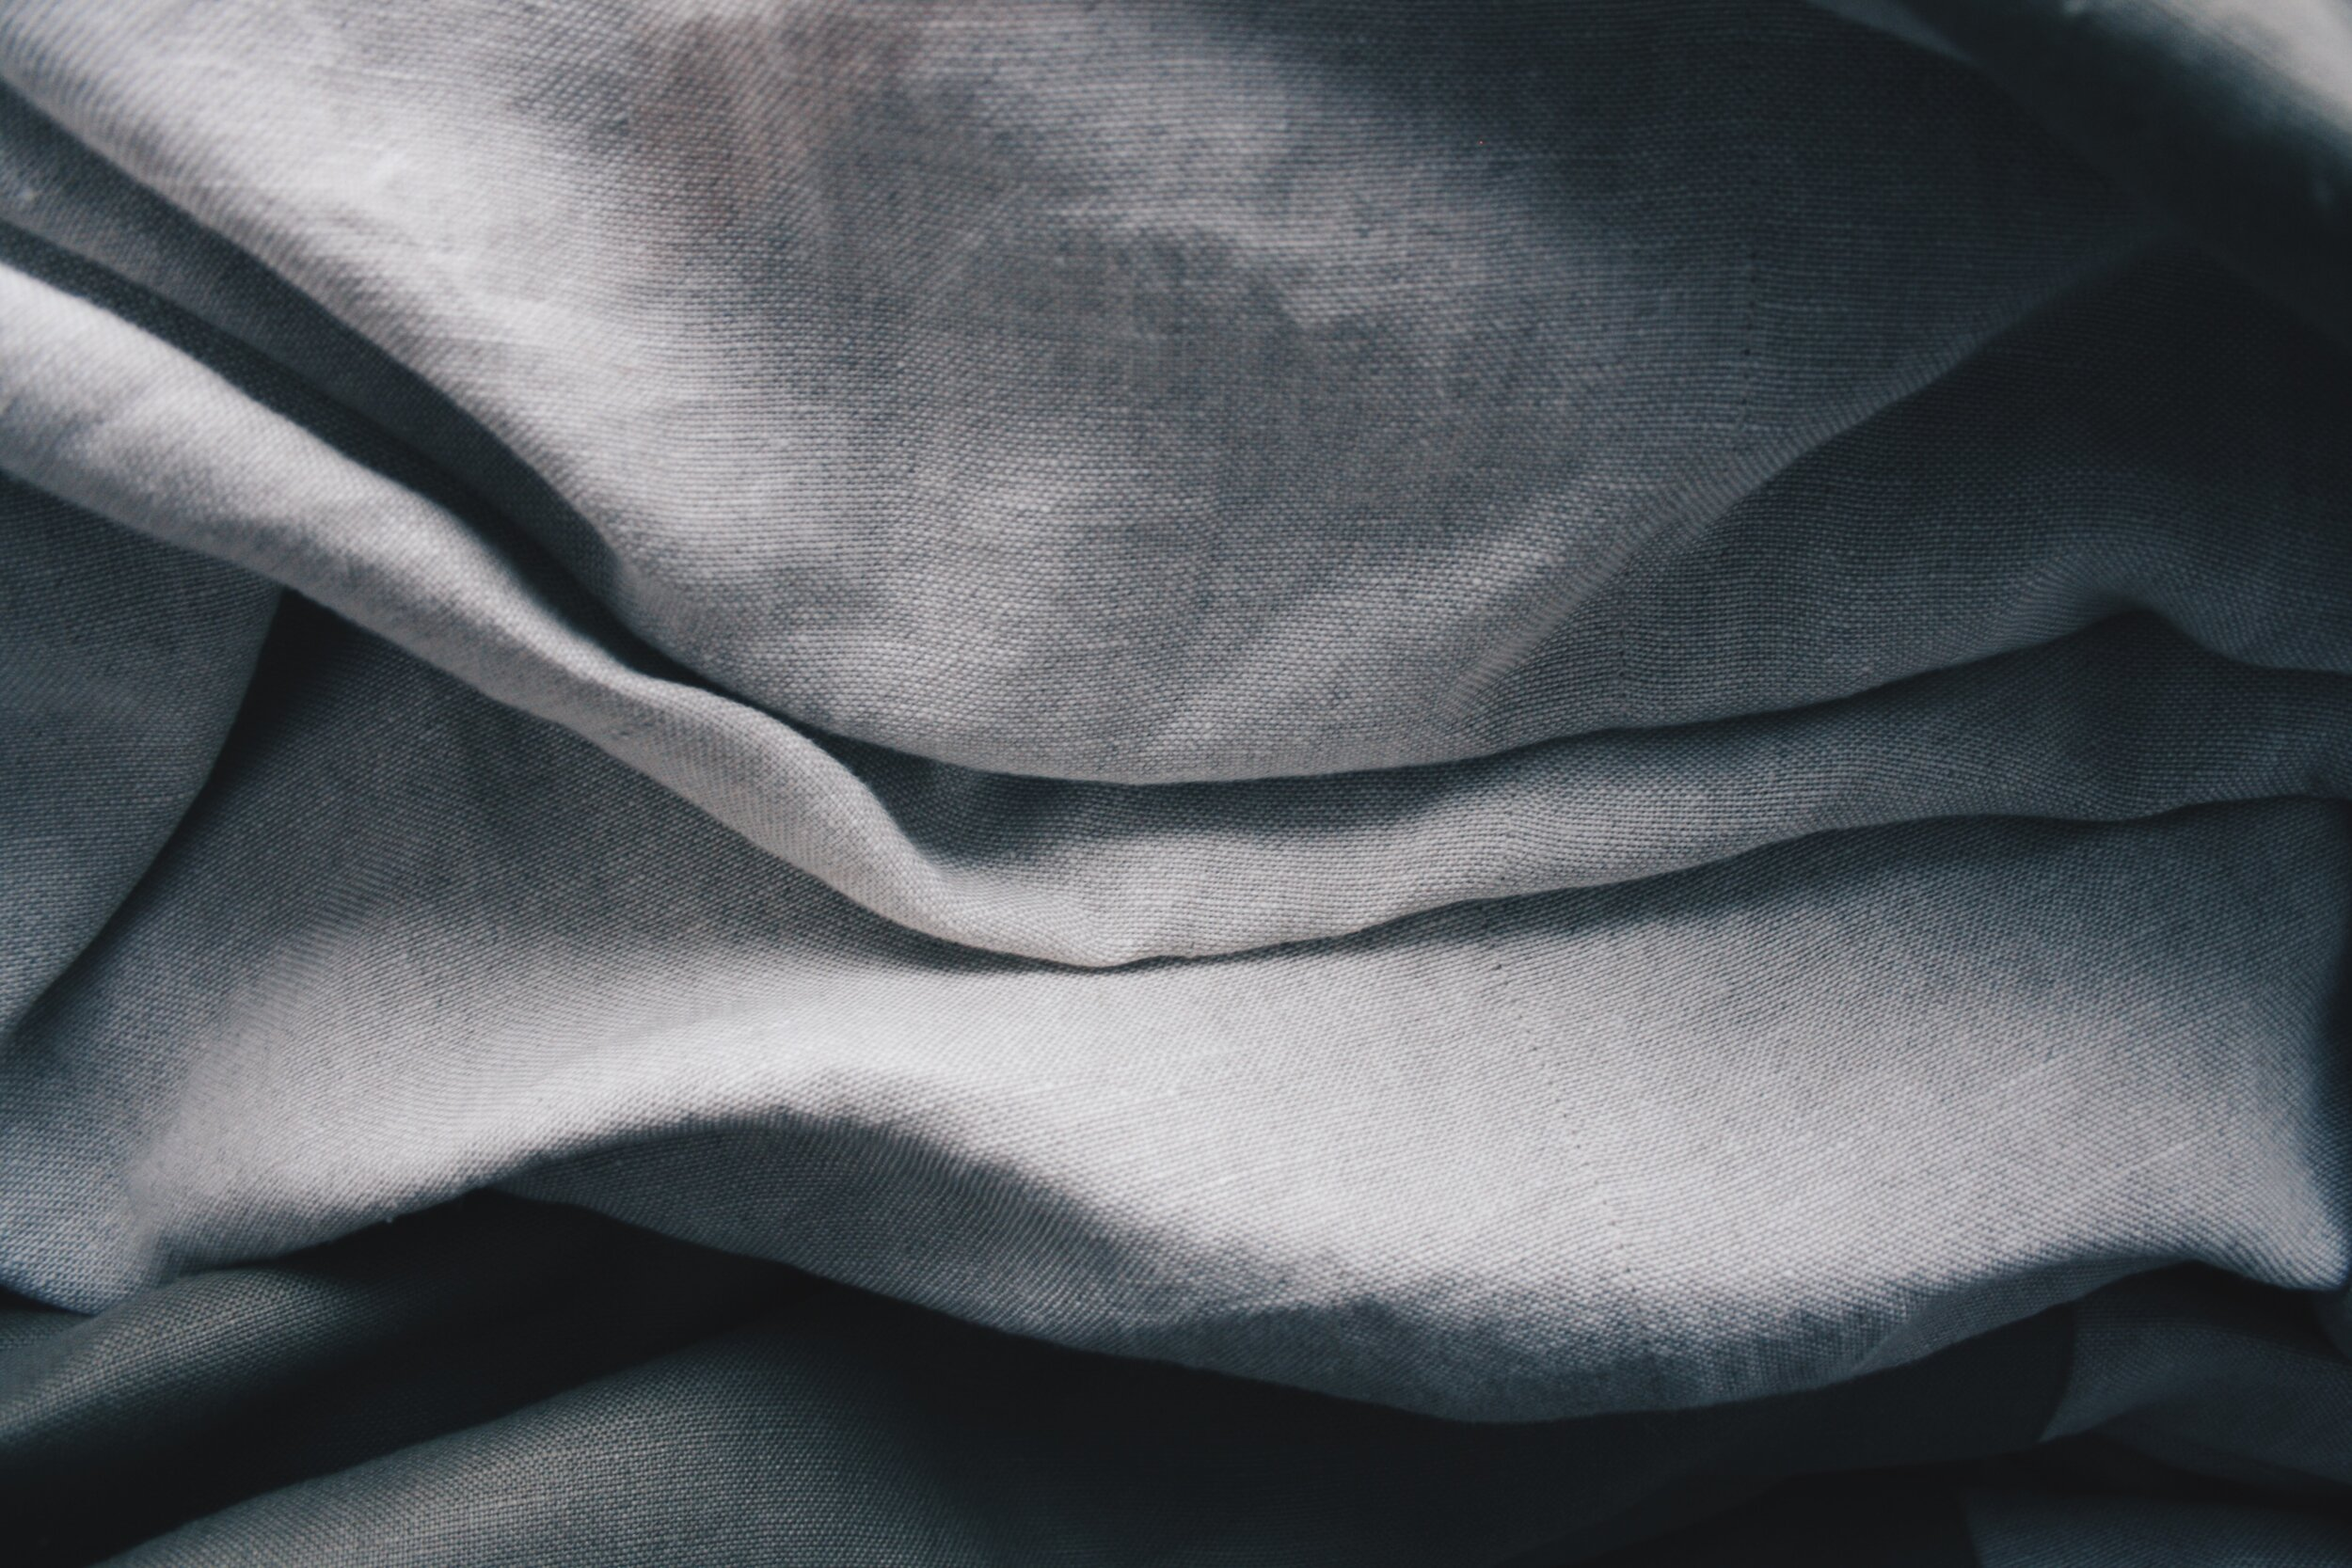 Hemp fabric sustainable